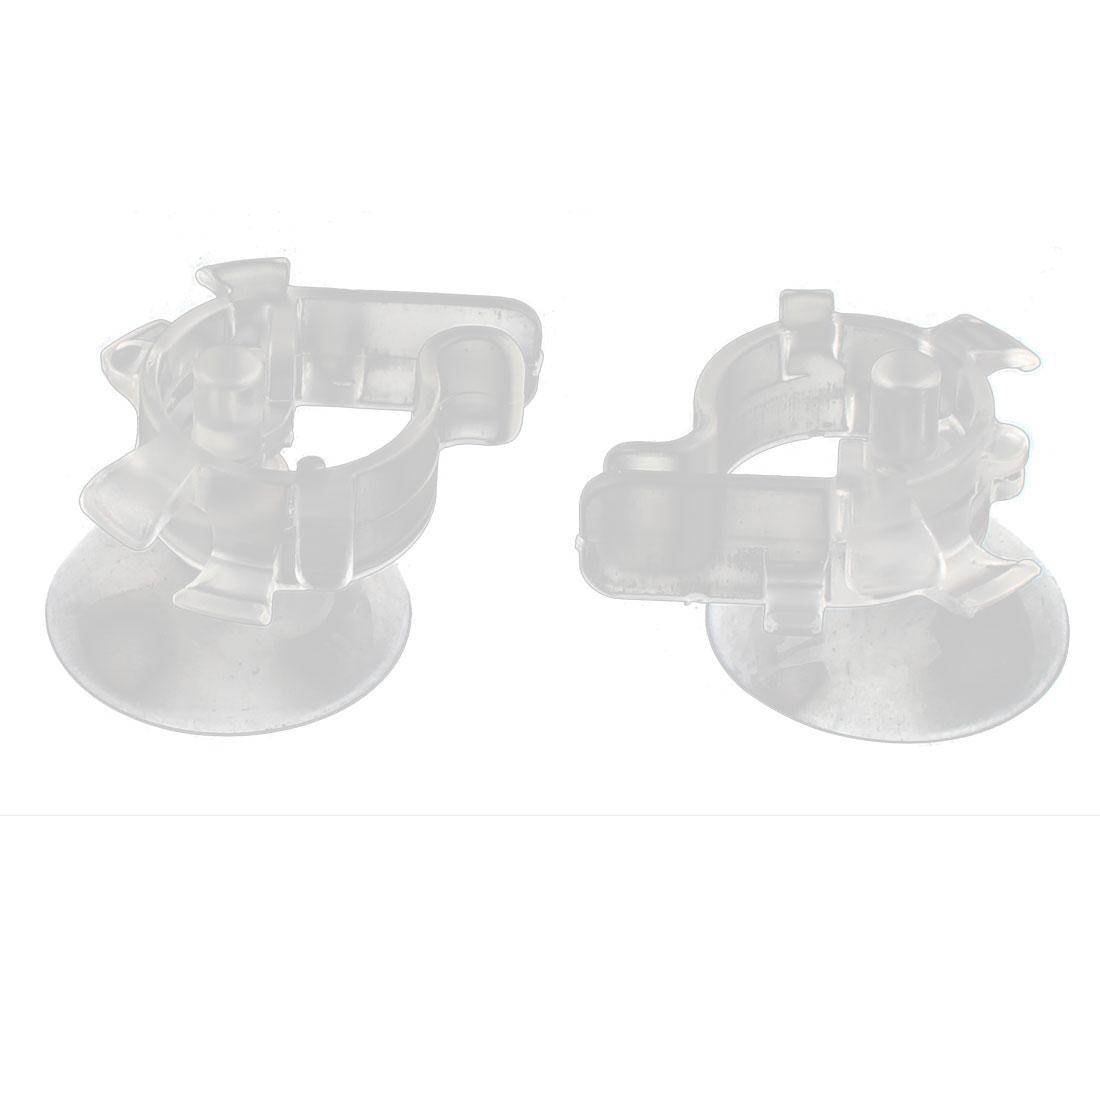 Aquarium Plastic Multi-functional Suction Cup Mount Bending Air Tube Tubing Valve Pipe Holder Clip Clamp Clear 2pcs